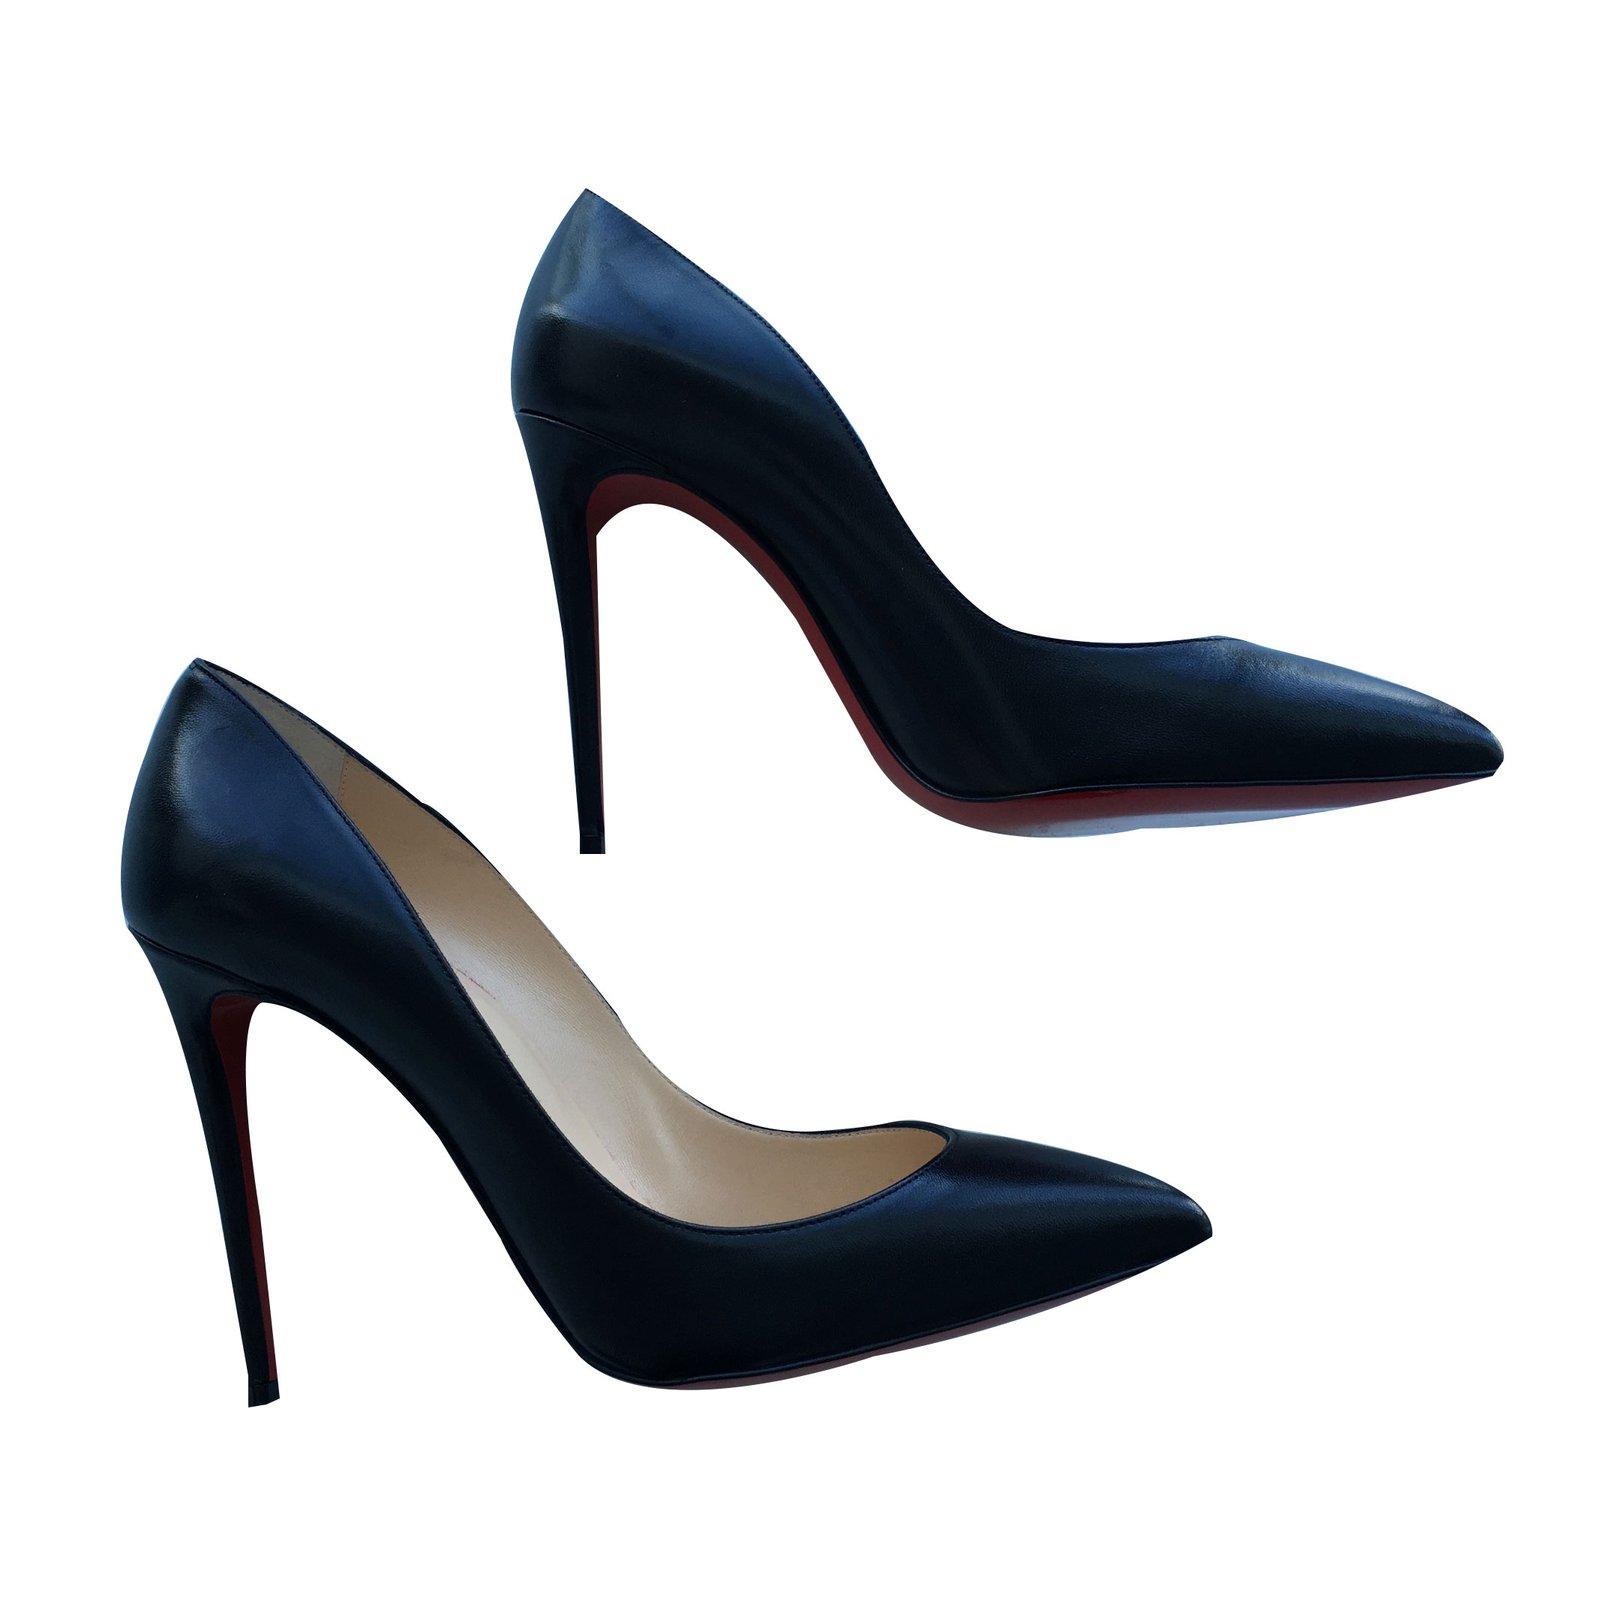 d67385b4ec91 Christian Louboutin PIGALLE Heels Leather Black ref.29316 - Joli Closet